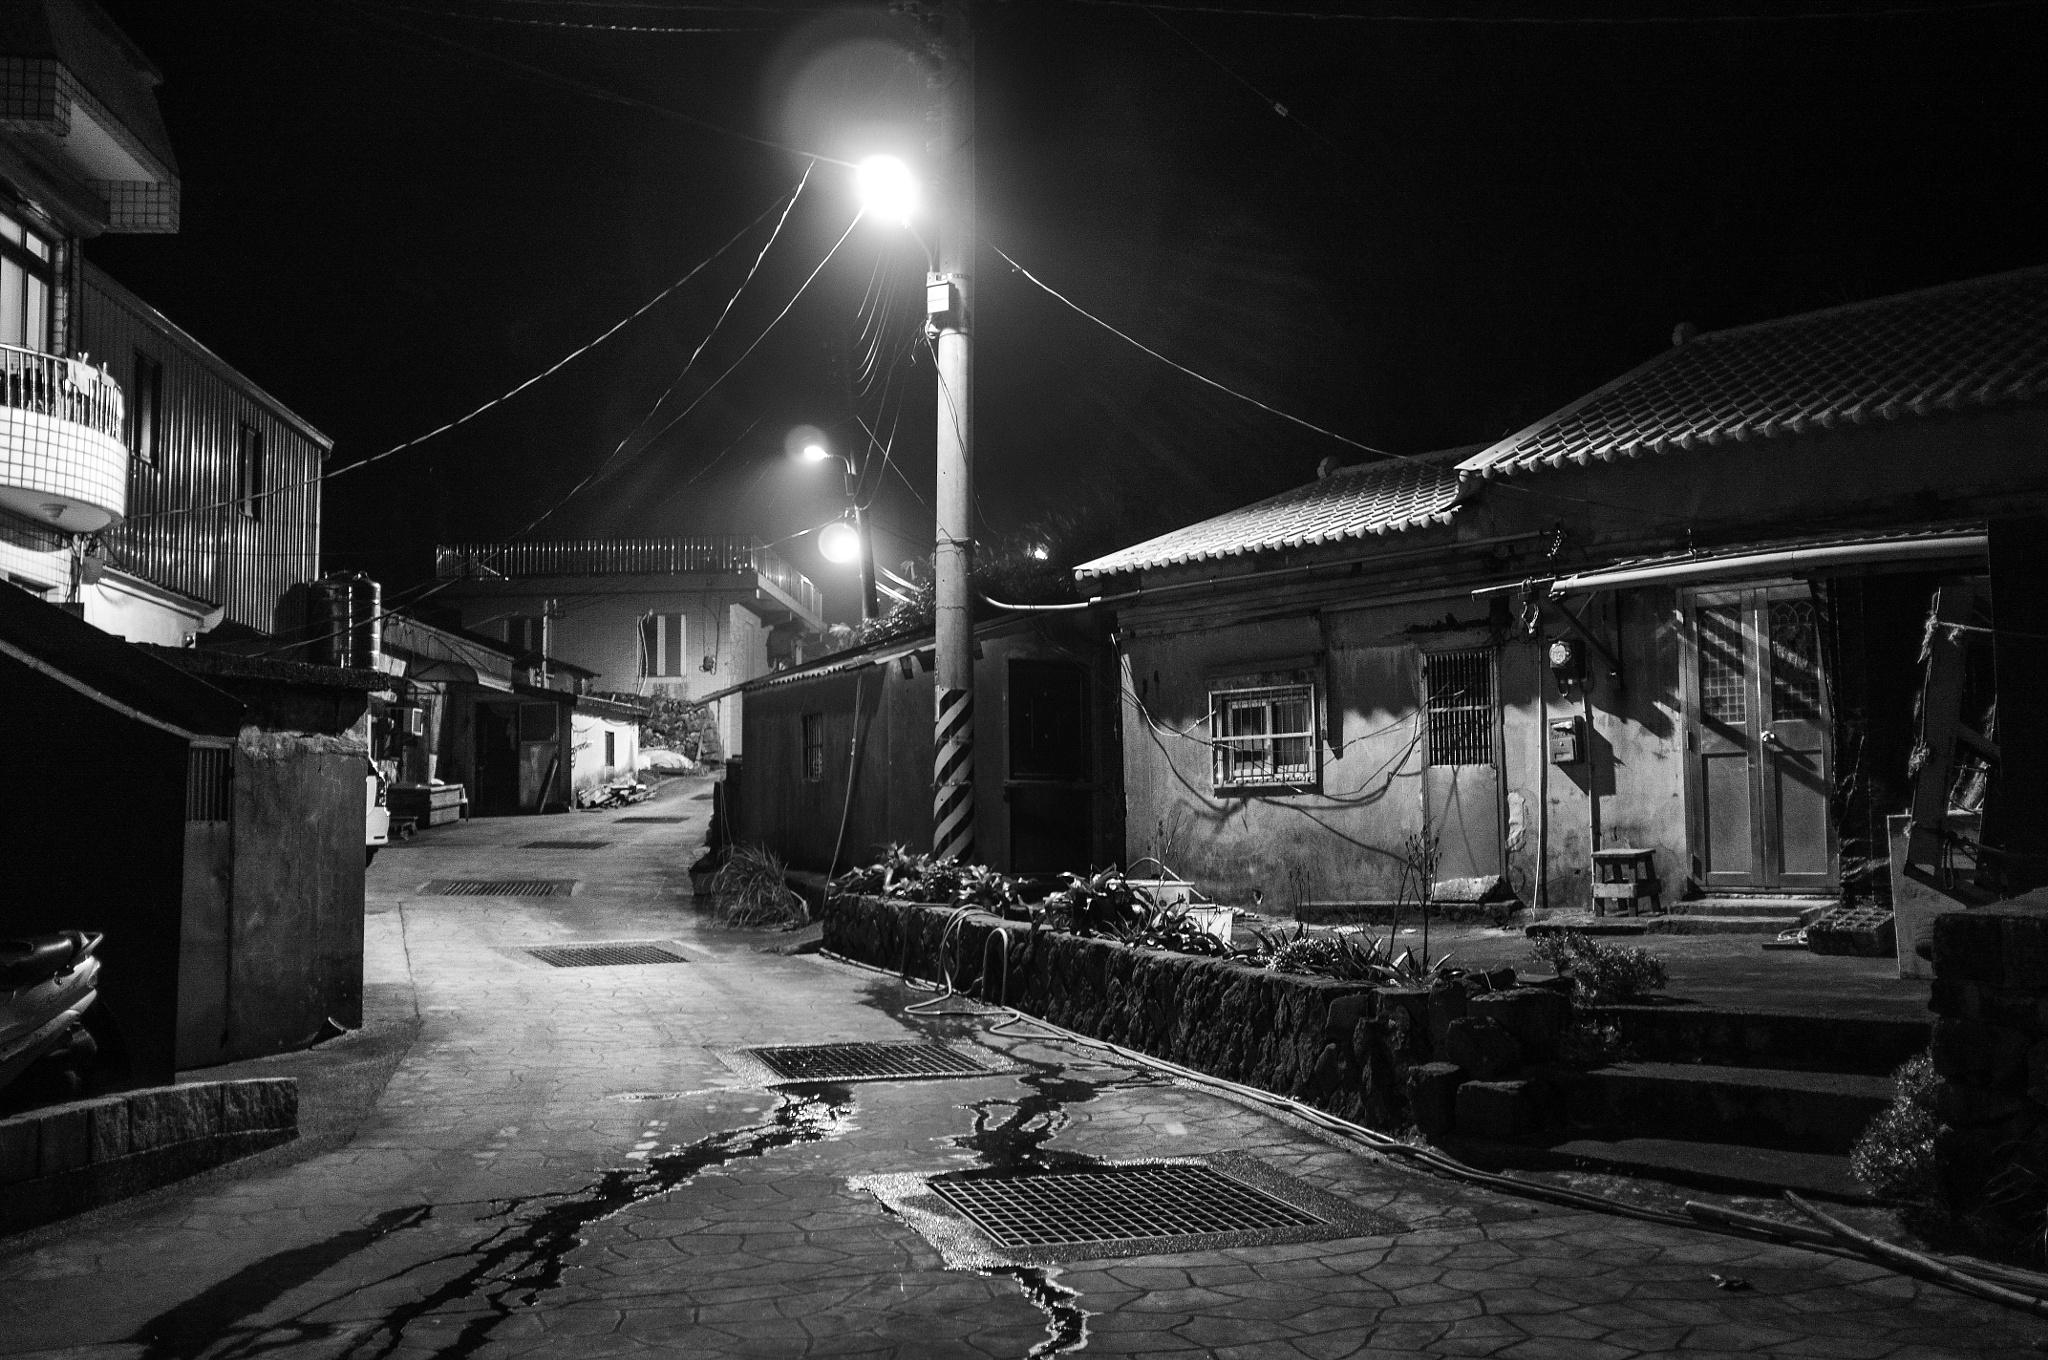 Night's whisper by Ansel Wang